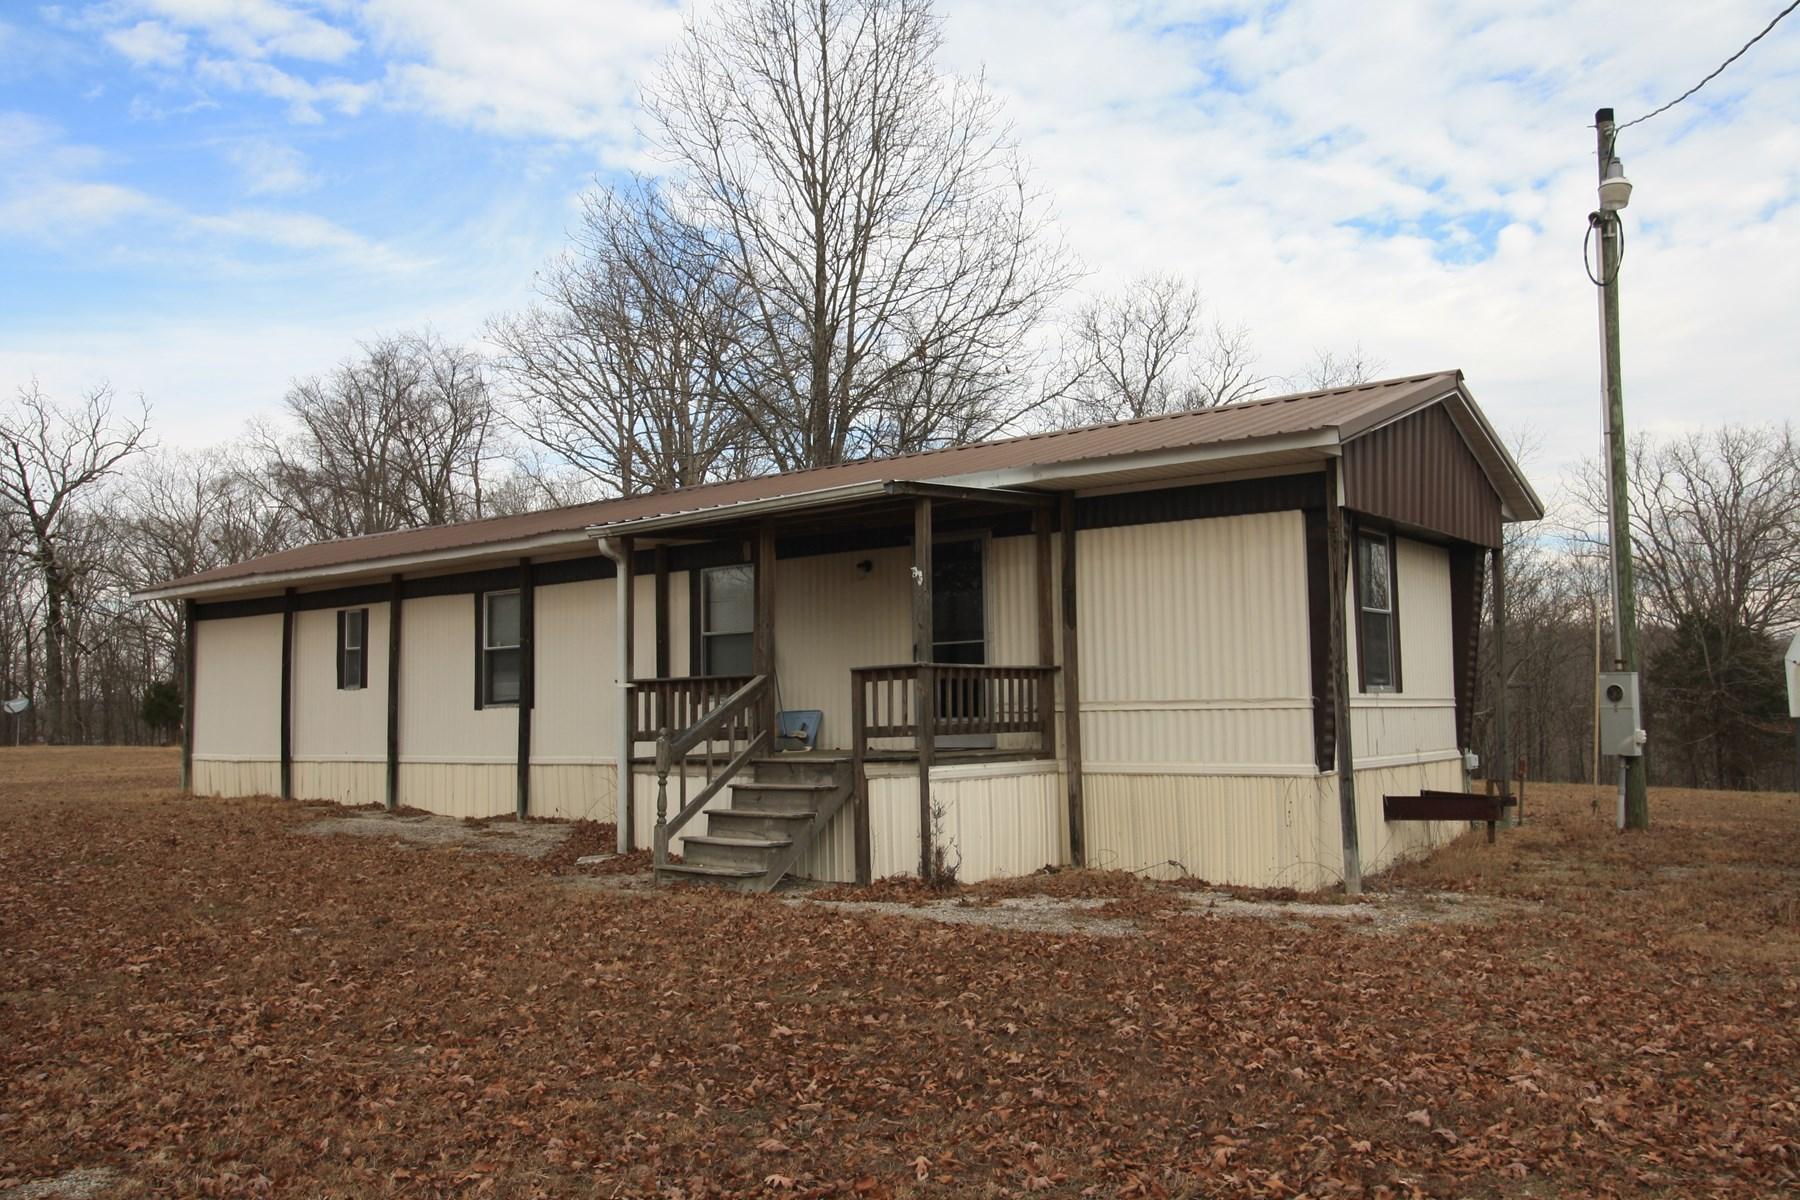 Greenville Missouri Recreational Real Estate for Sale